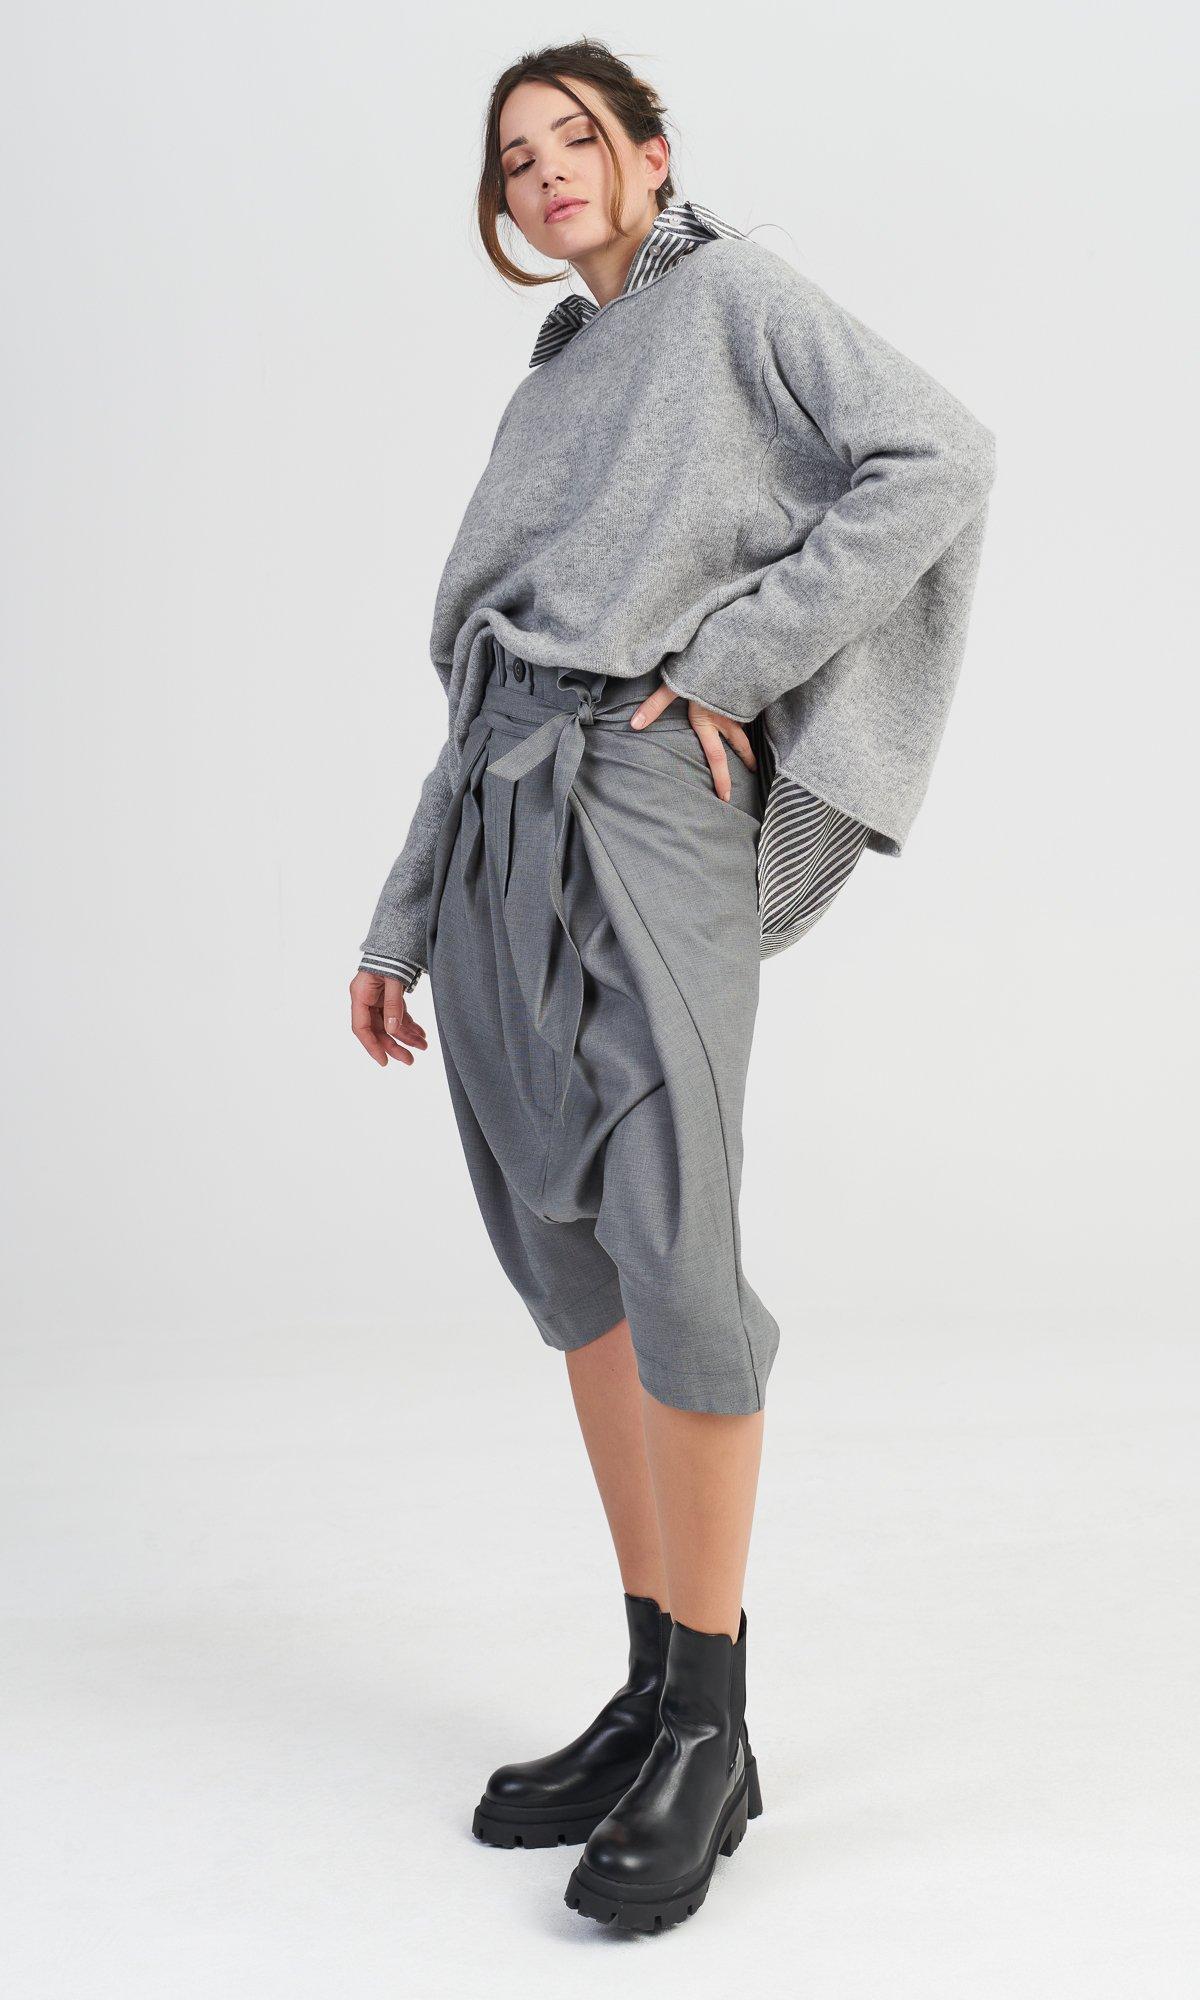 Drop Crotch Cold Wool Pants